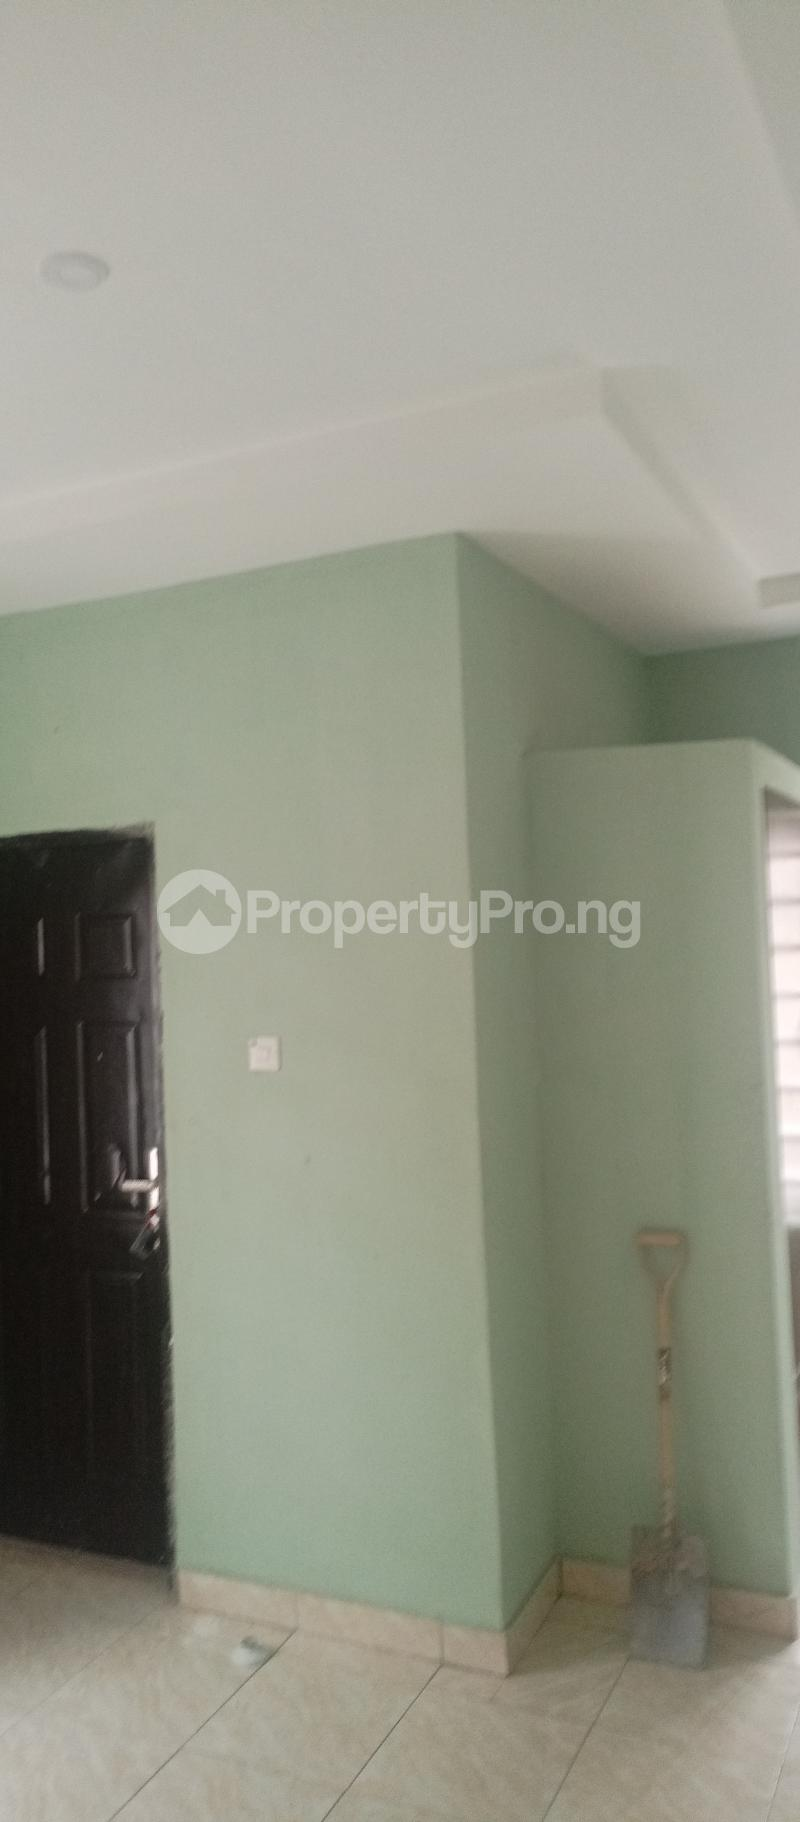 2 bedroom Flat / Apartment for rent Peace Estate Baruwa Ipaja Road Lagos Baruwa Ipaja Lagos - 7